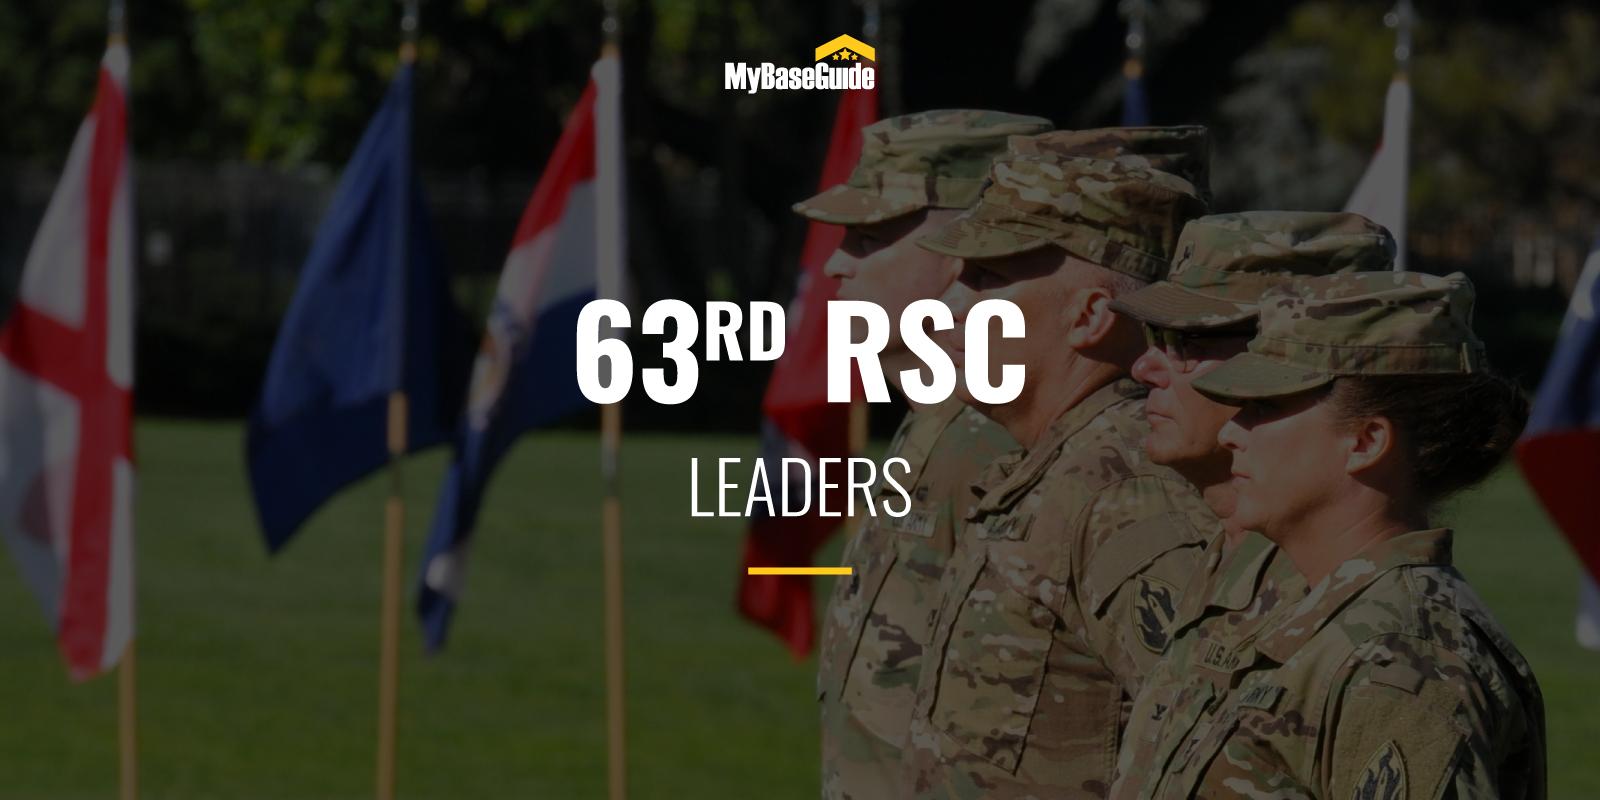 63RD RSC Leaders